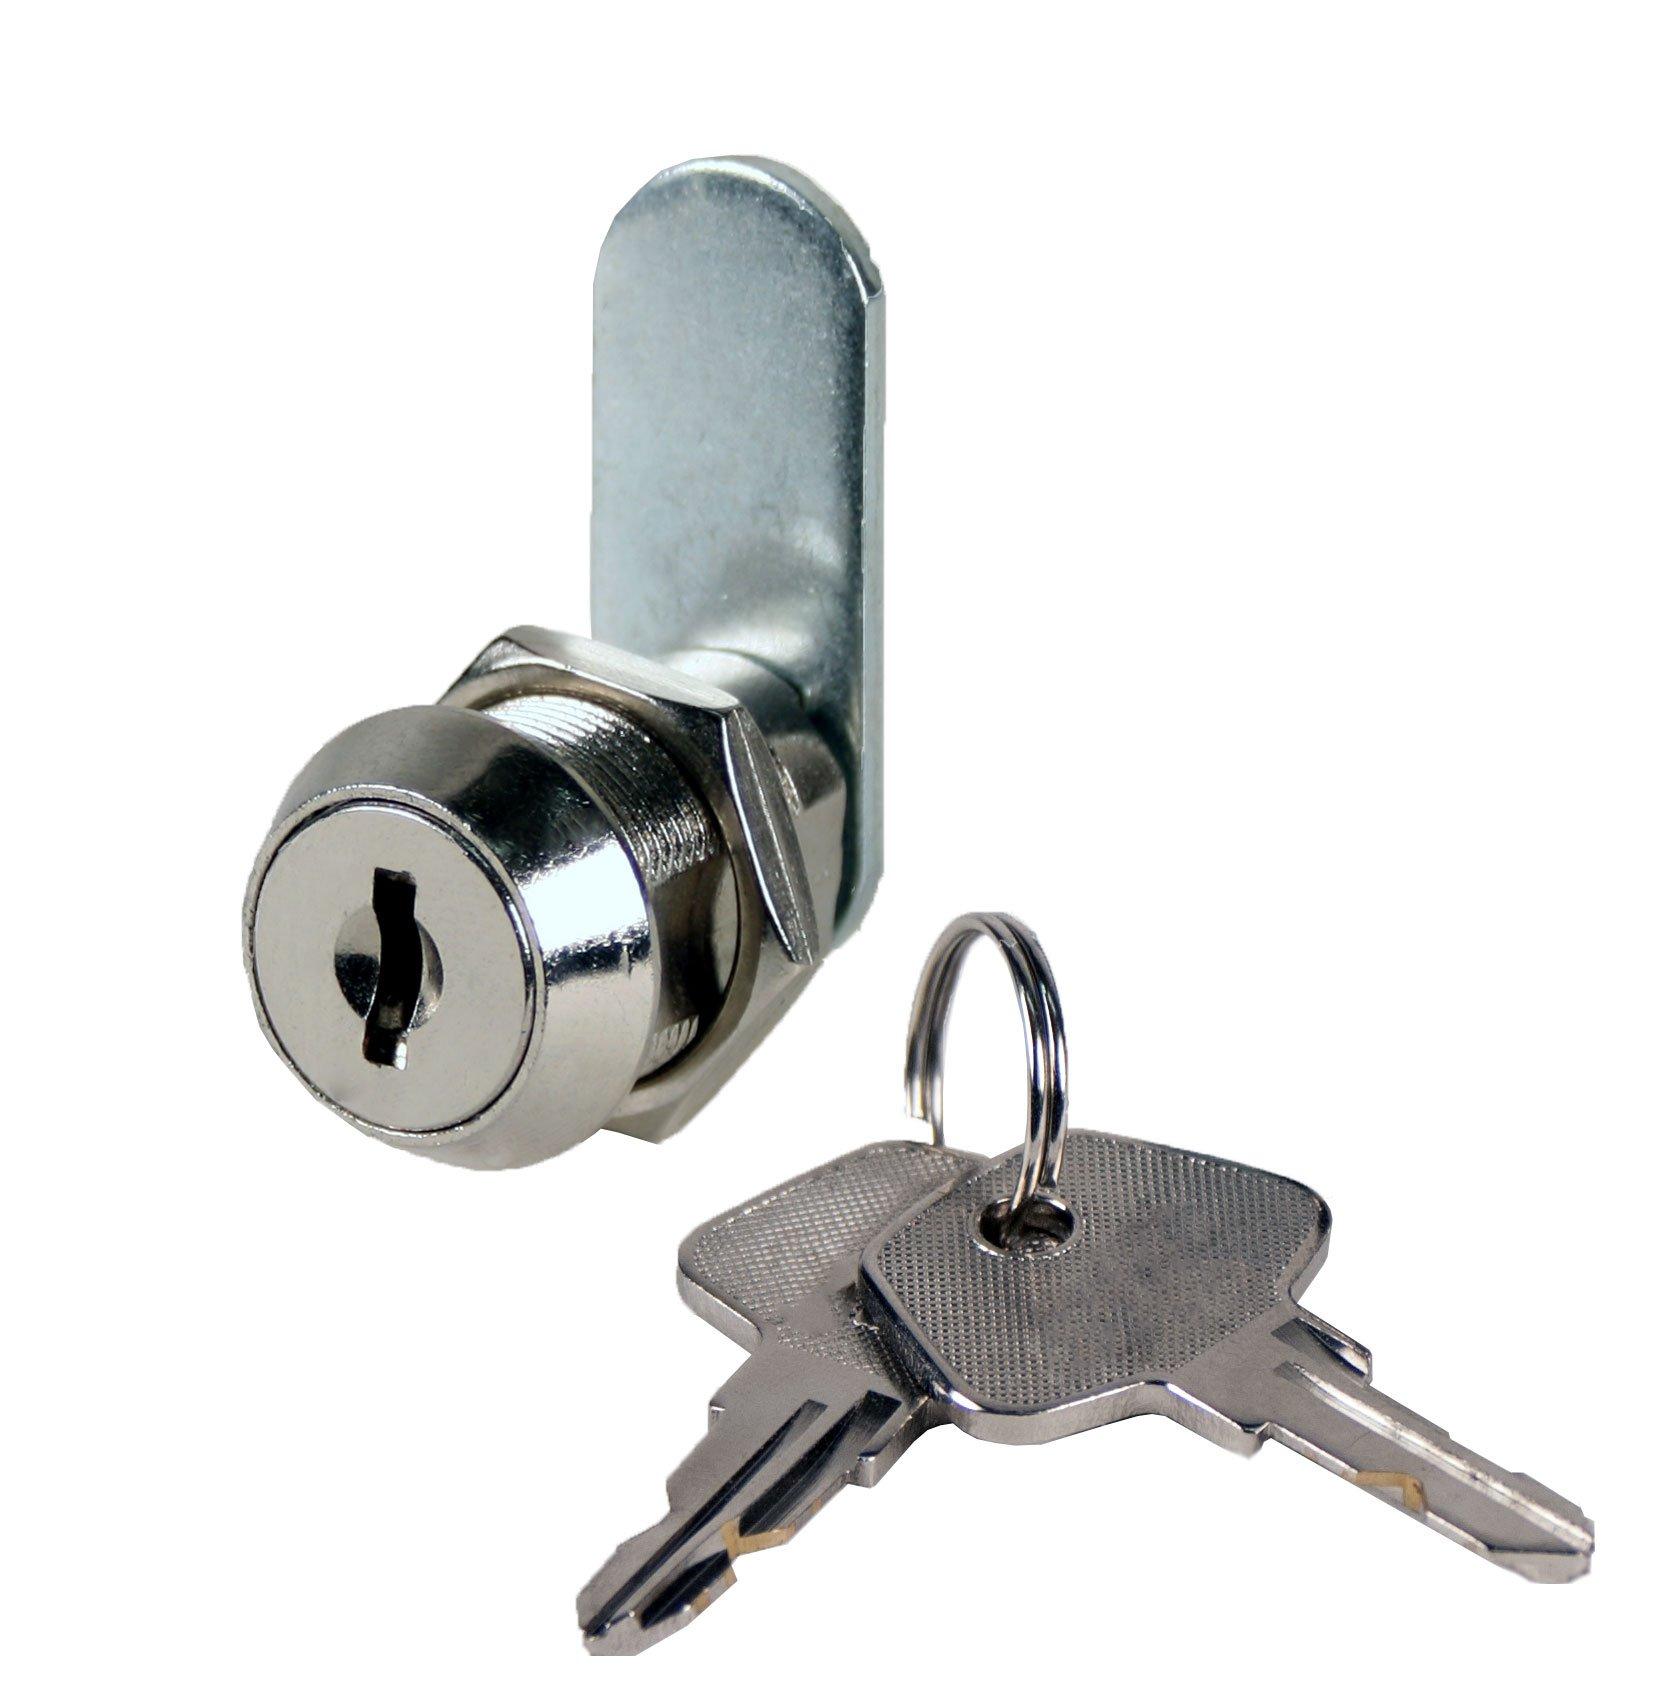 FJM Security 3403AM-KA High Security Disc Tumbler Cam Lock with 7/8'' Cylinder and Chrome Finish, Keyed Alike